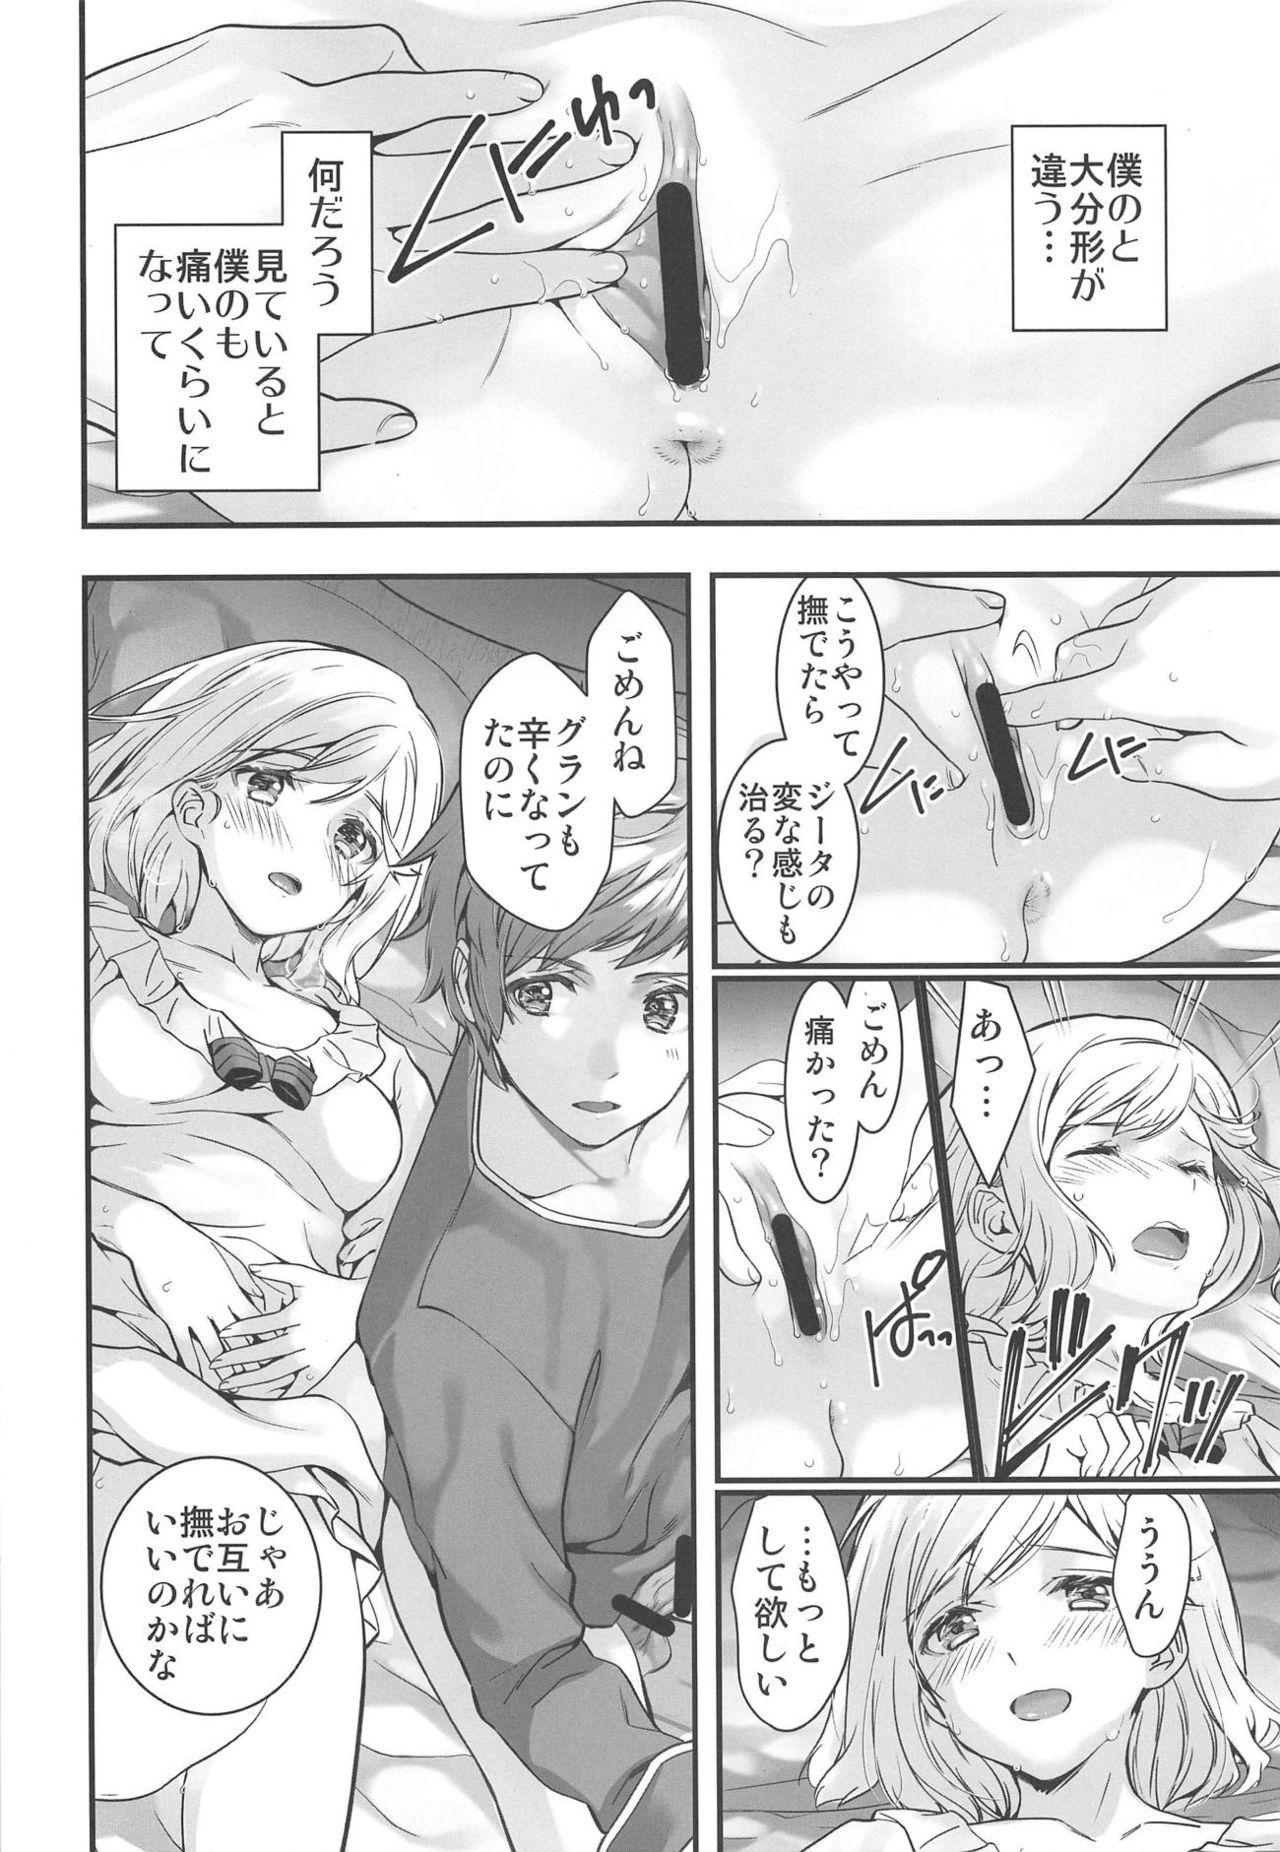 Haitoku no Ringo 10